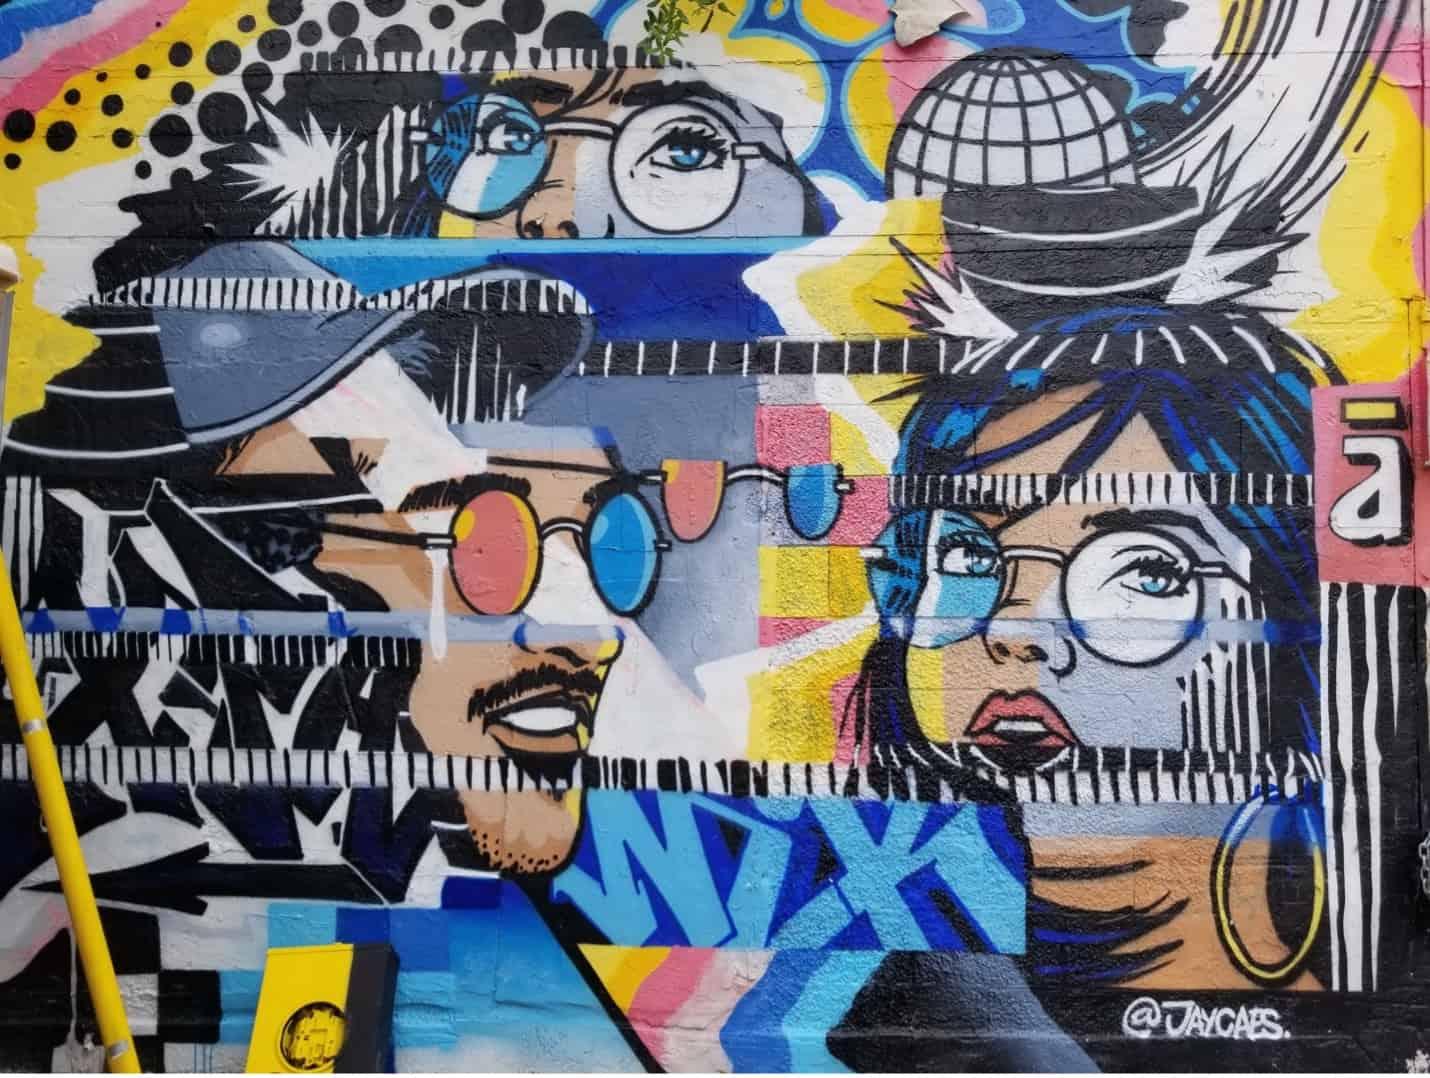 Pop art is an art movement that enjoys widespread popularity even today.